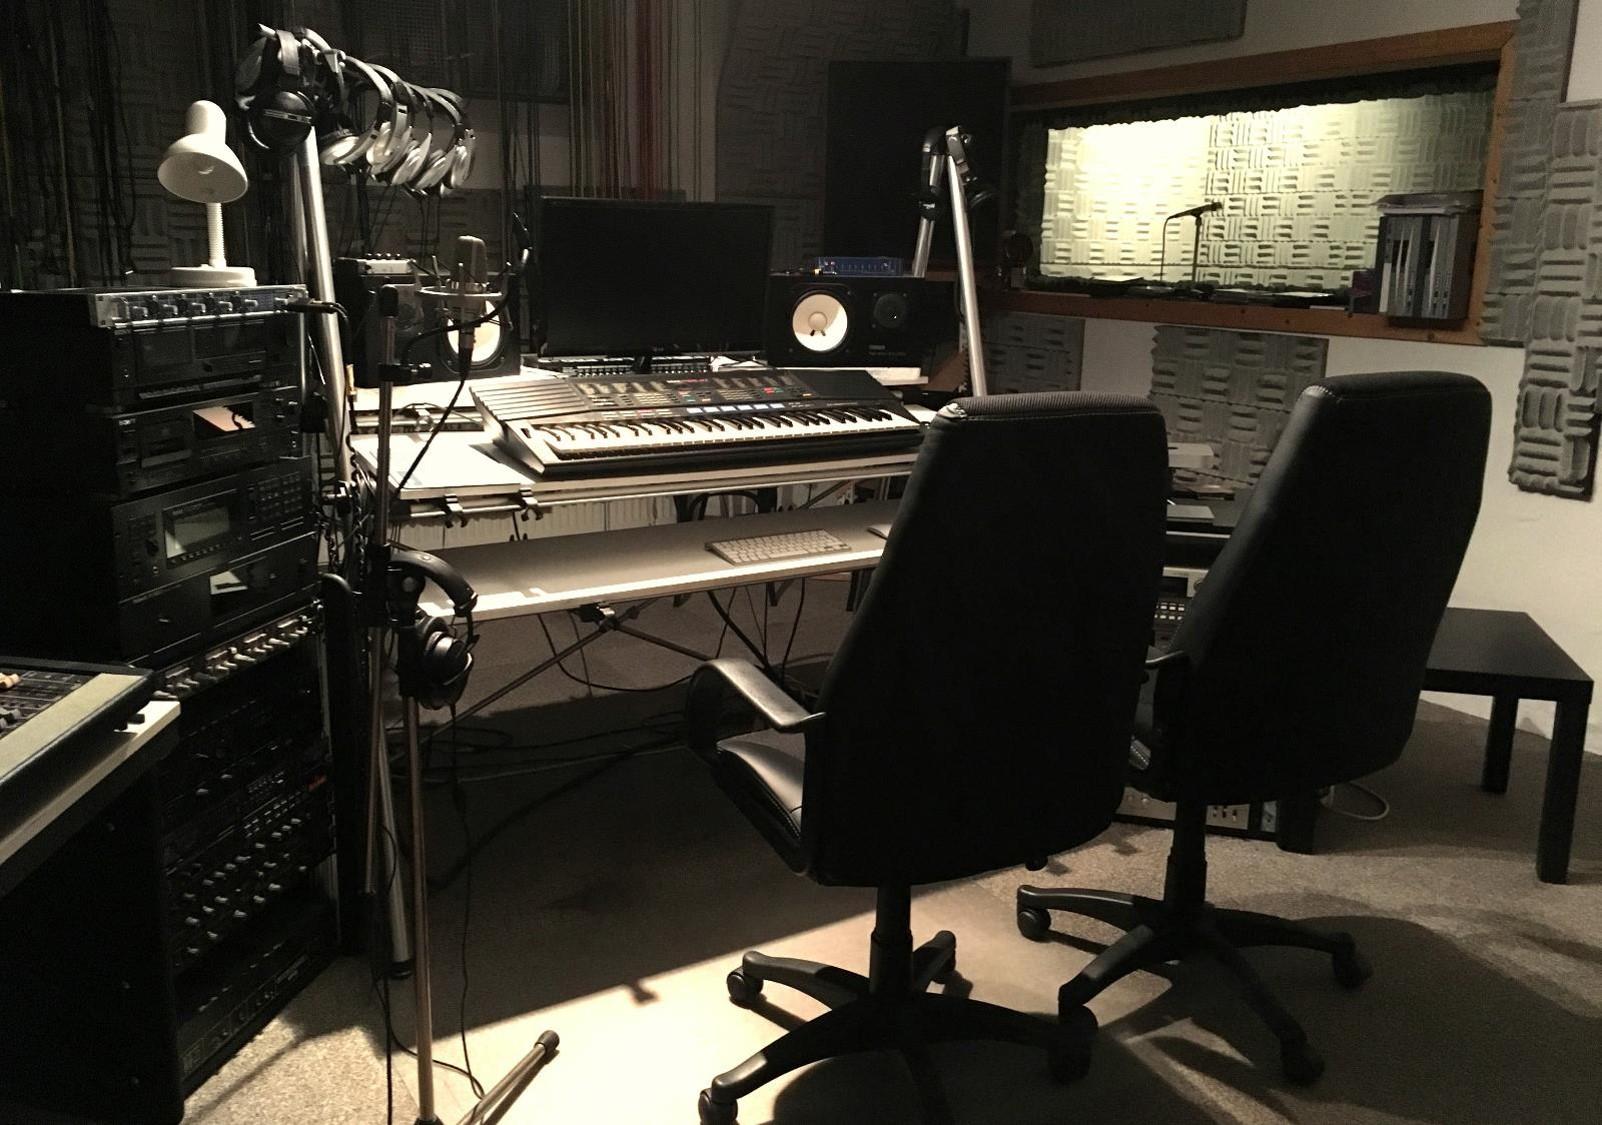 Studio-Musikproduktion-Hans-Dieter-Franke-27607-Langen k